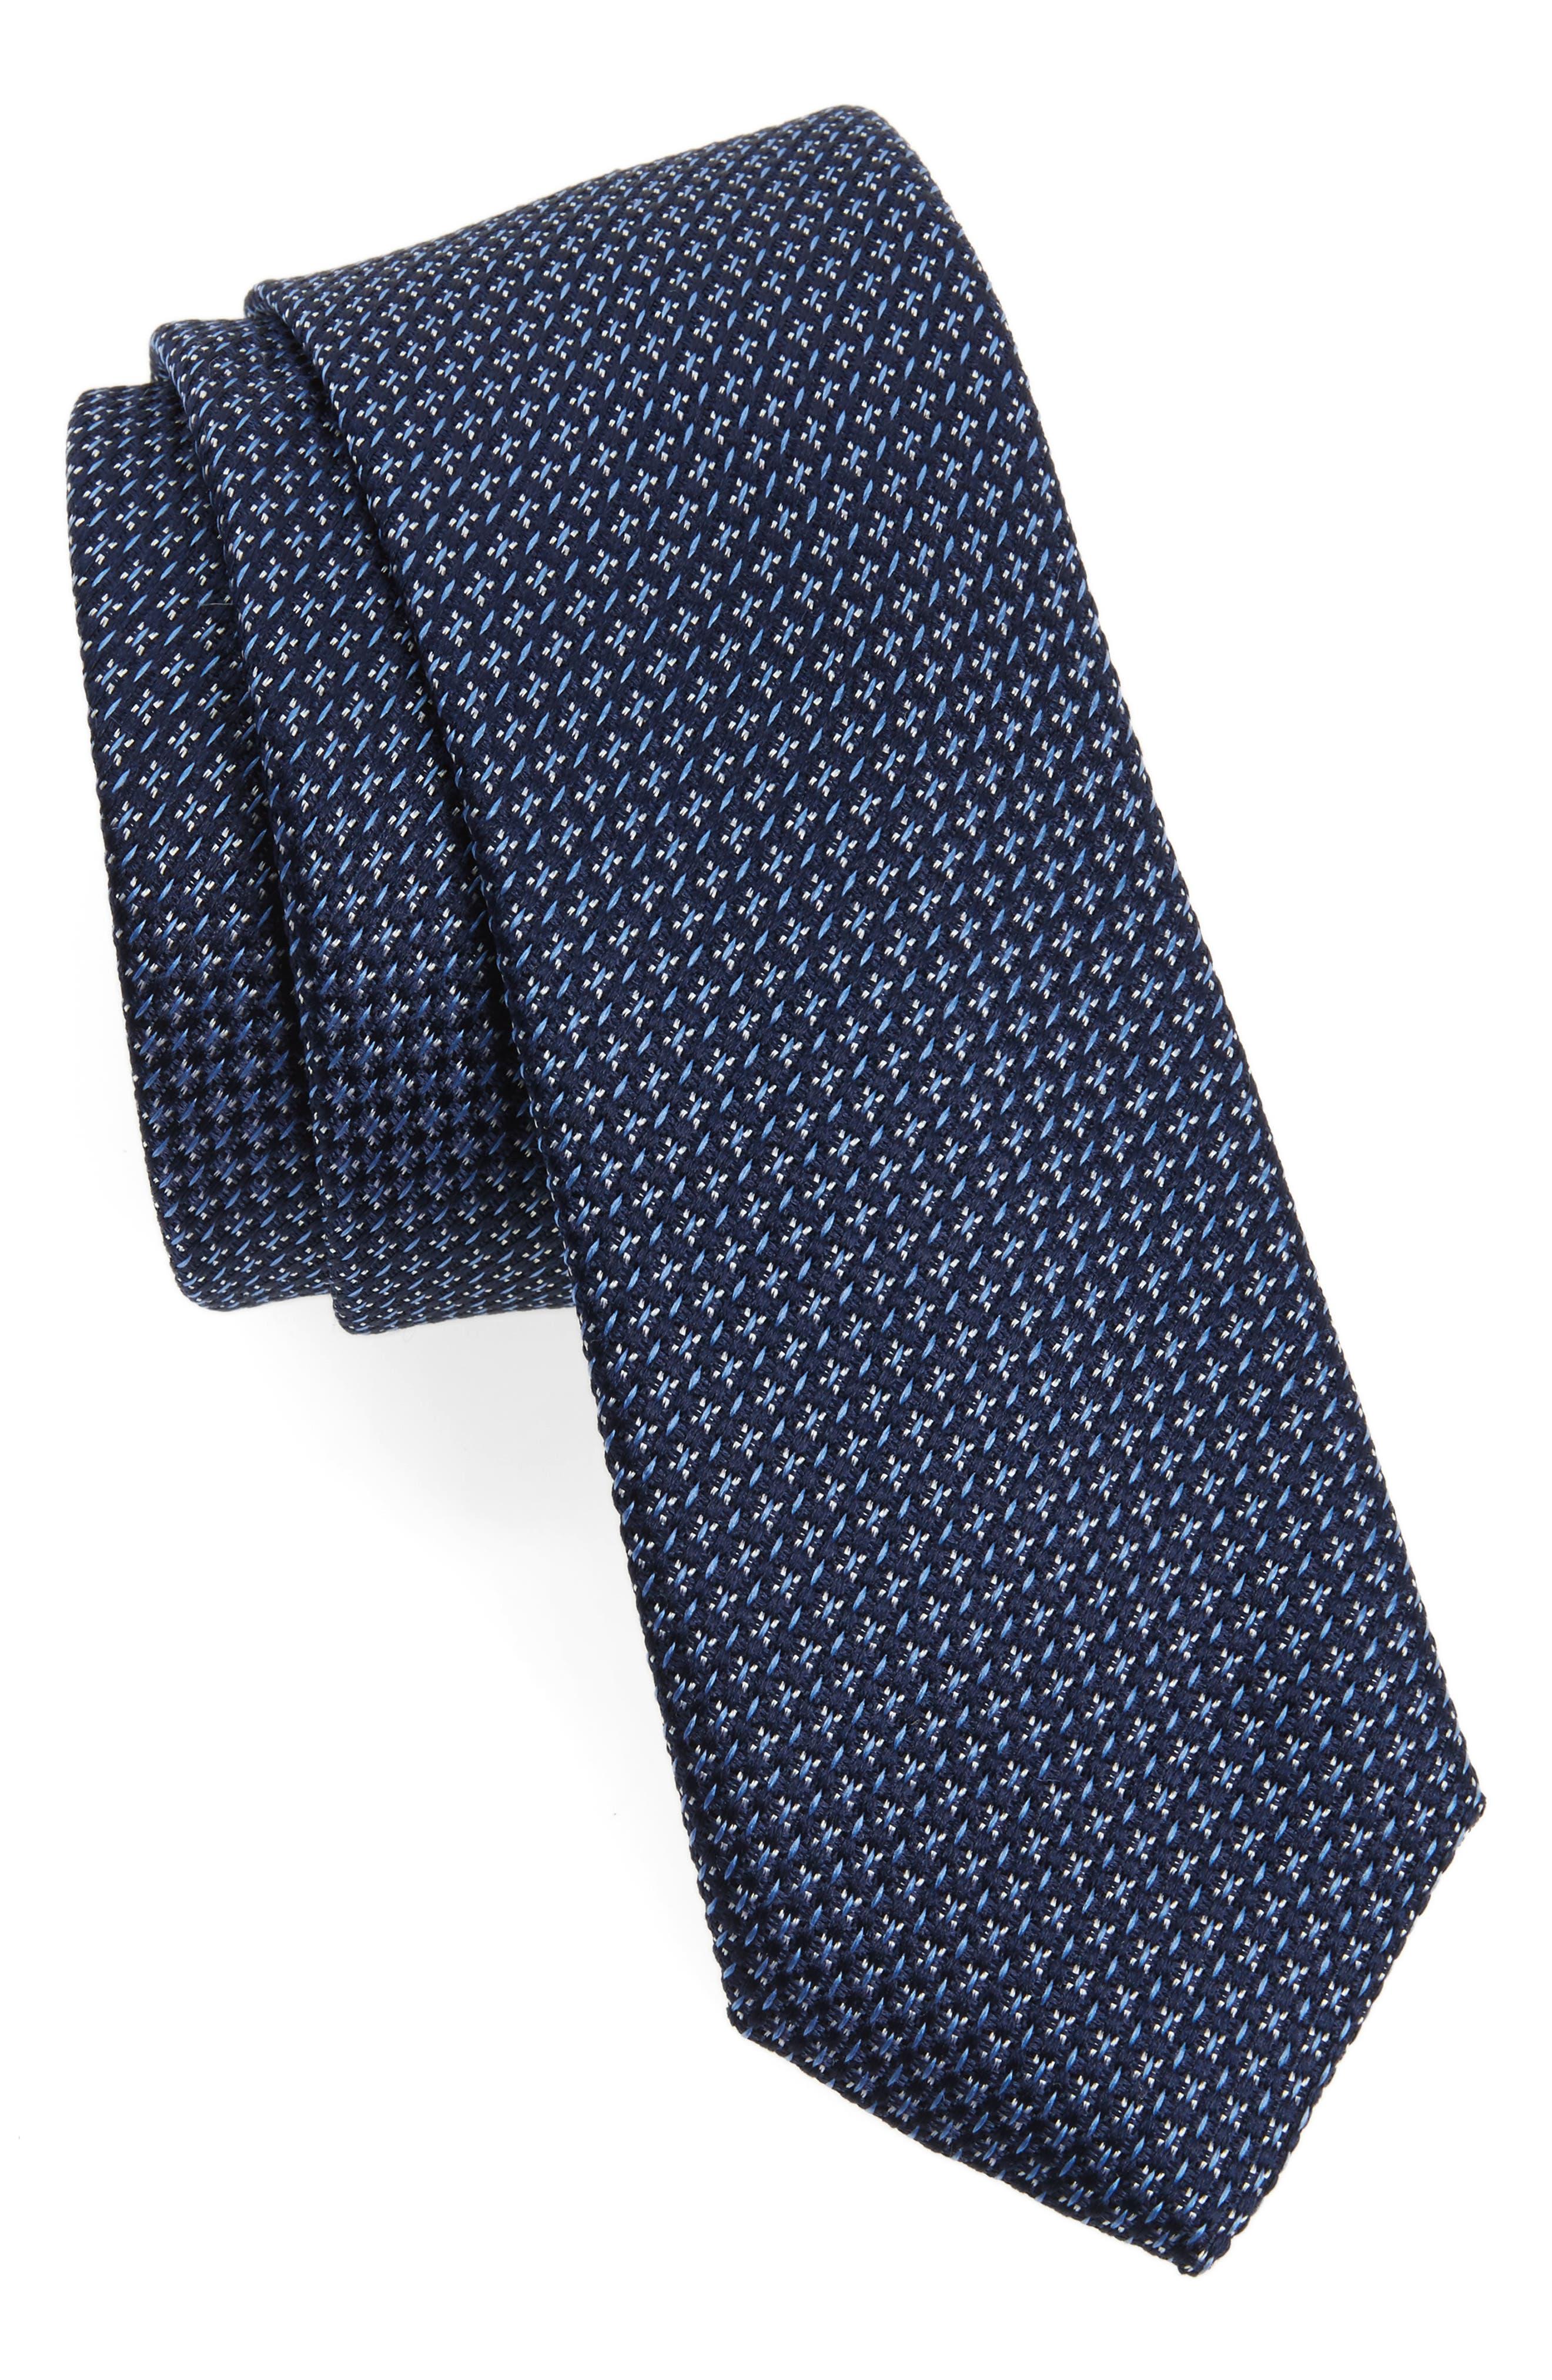 Main Image - Calibrate Knitex Solid Silk Tie